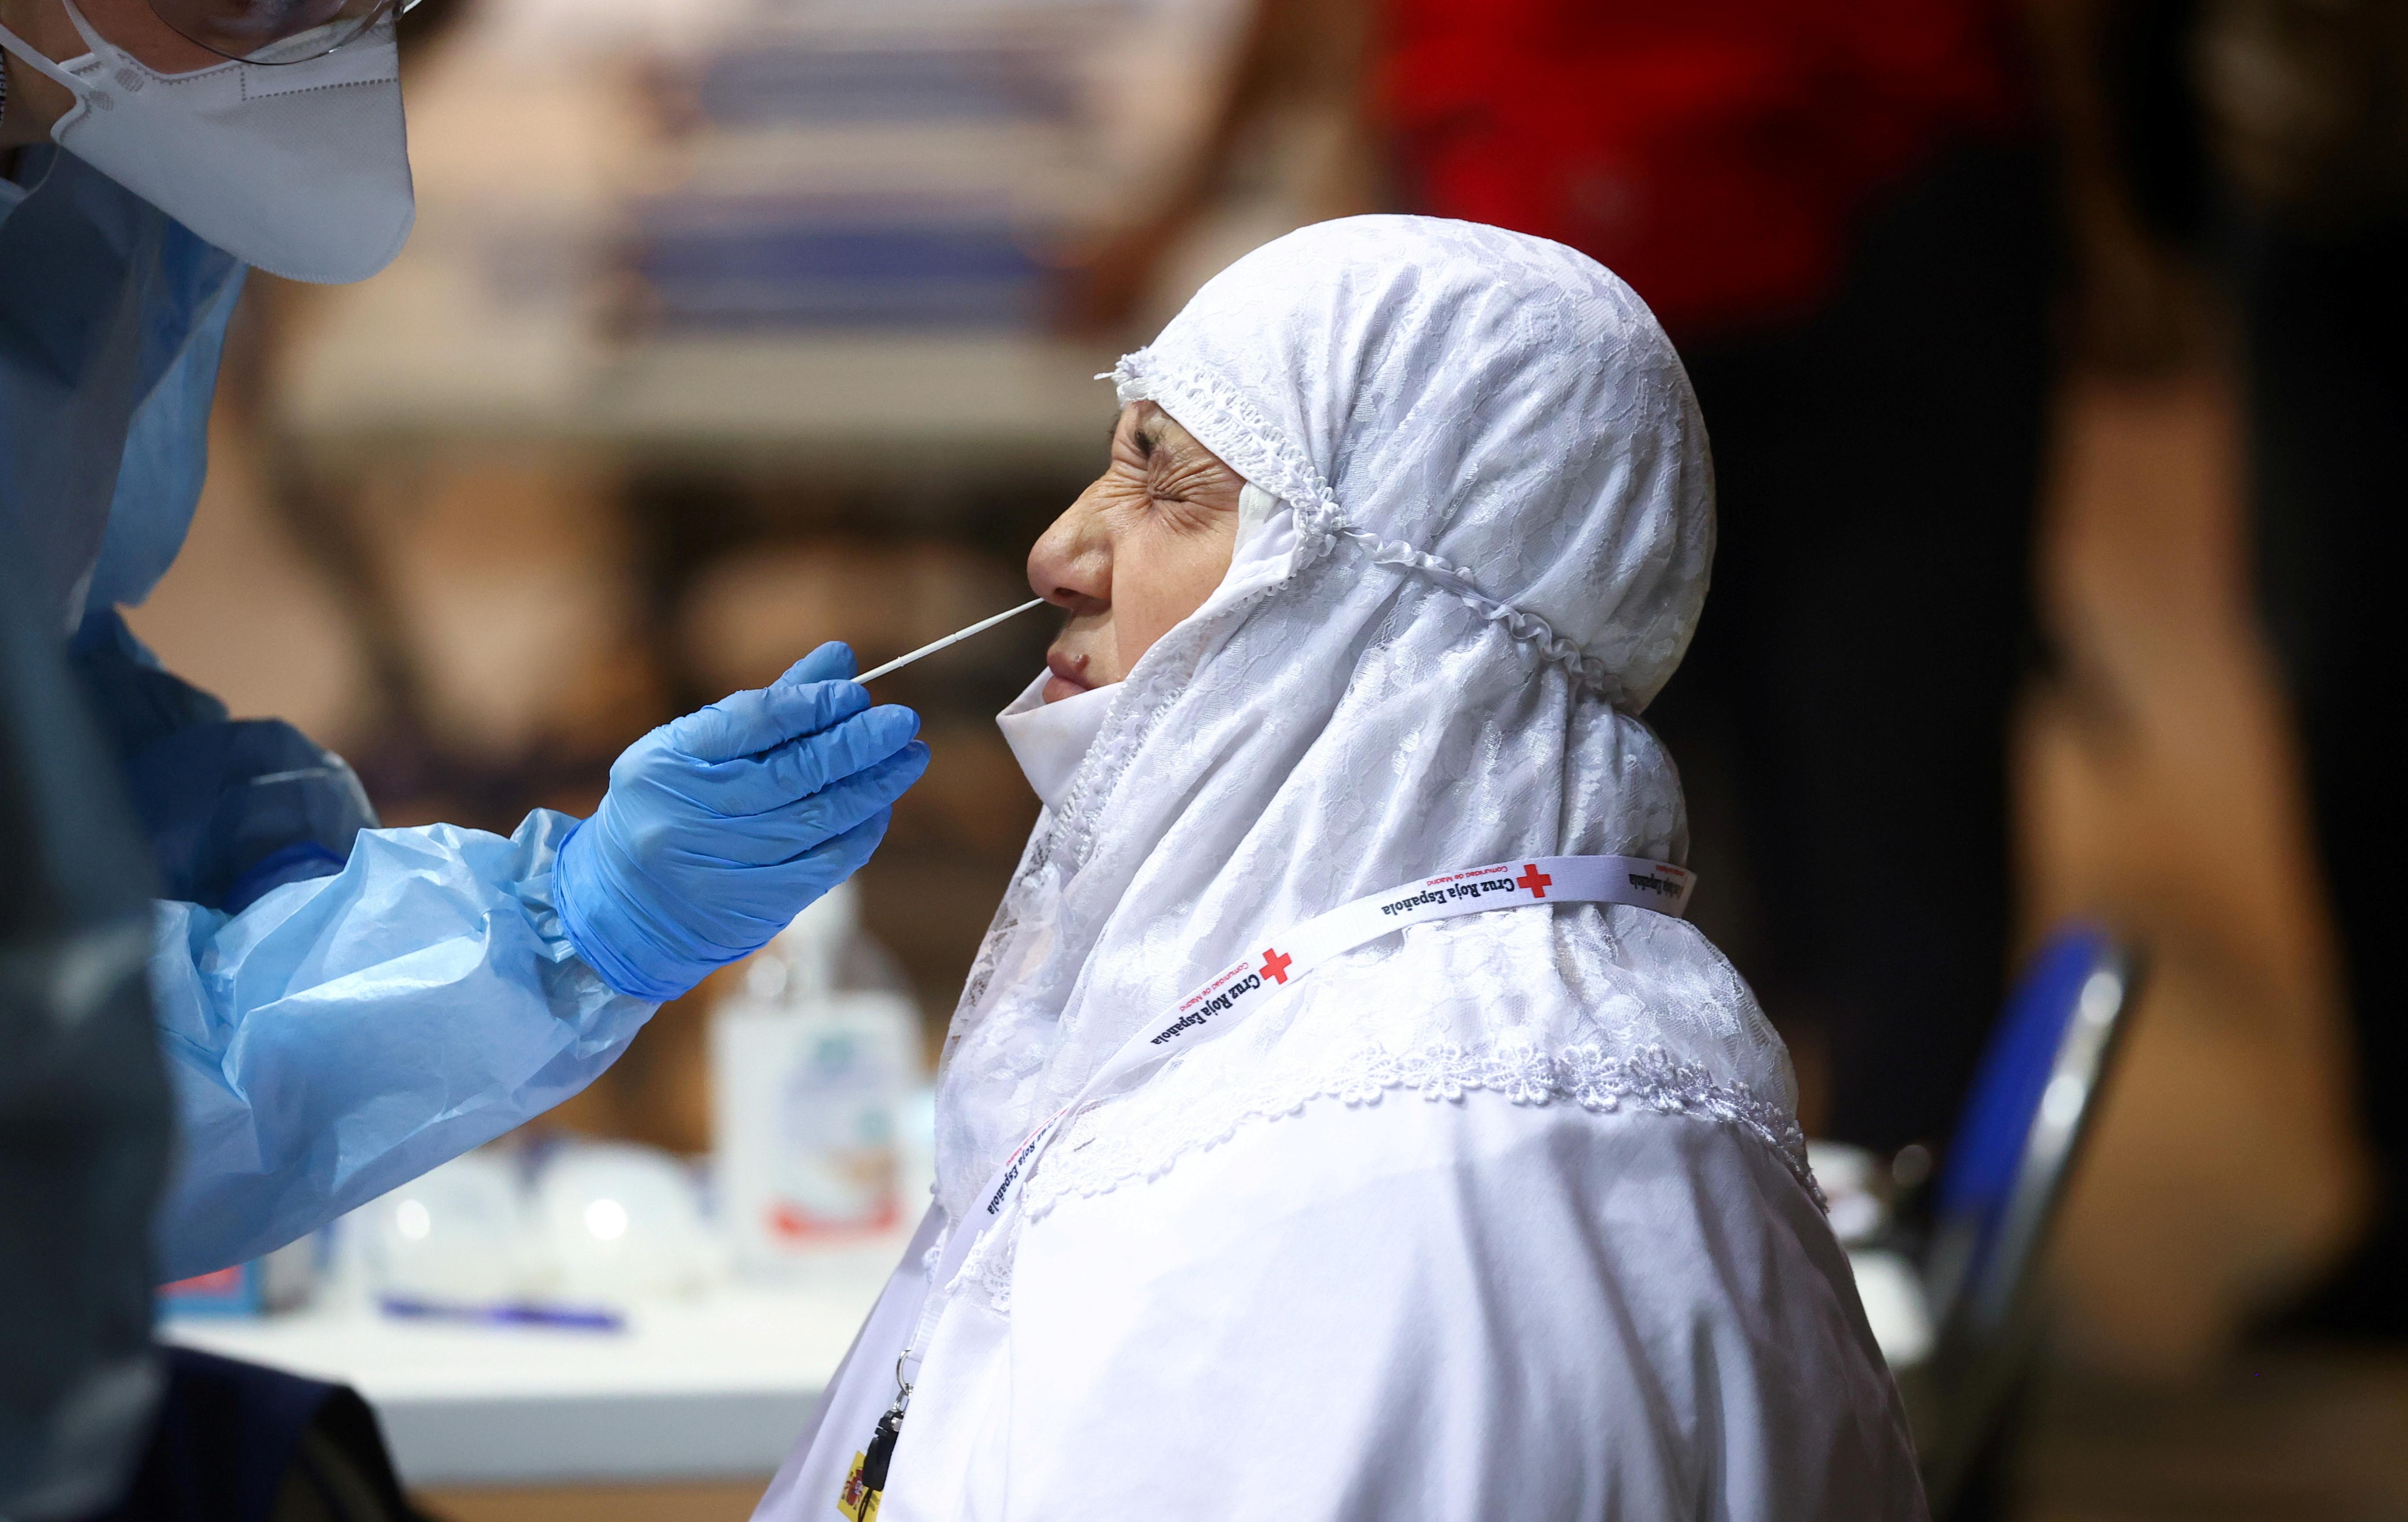 An evacuee reacts during coronavirus disease (COVID-19) tests